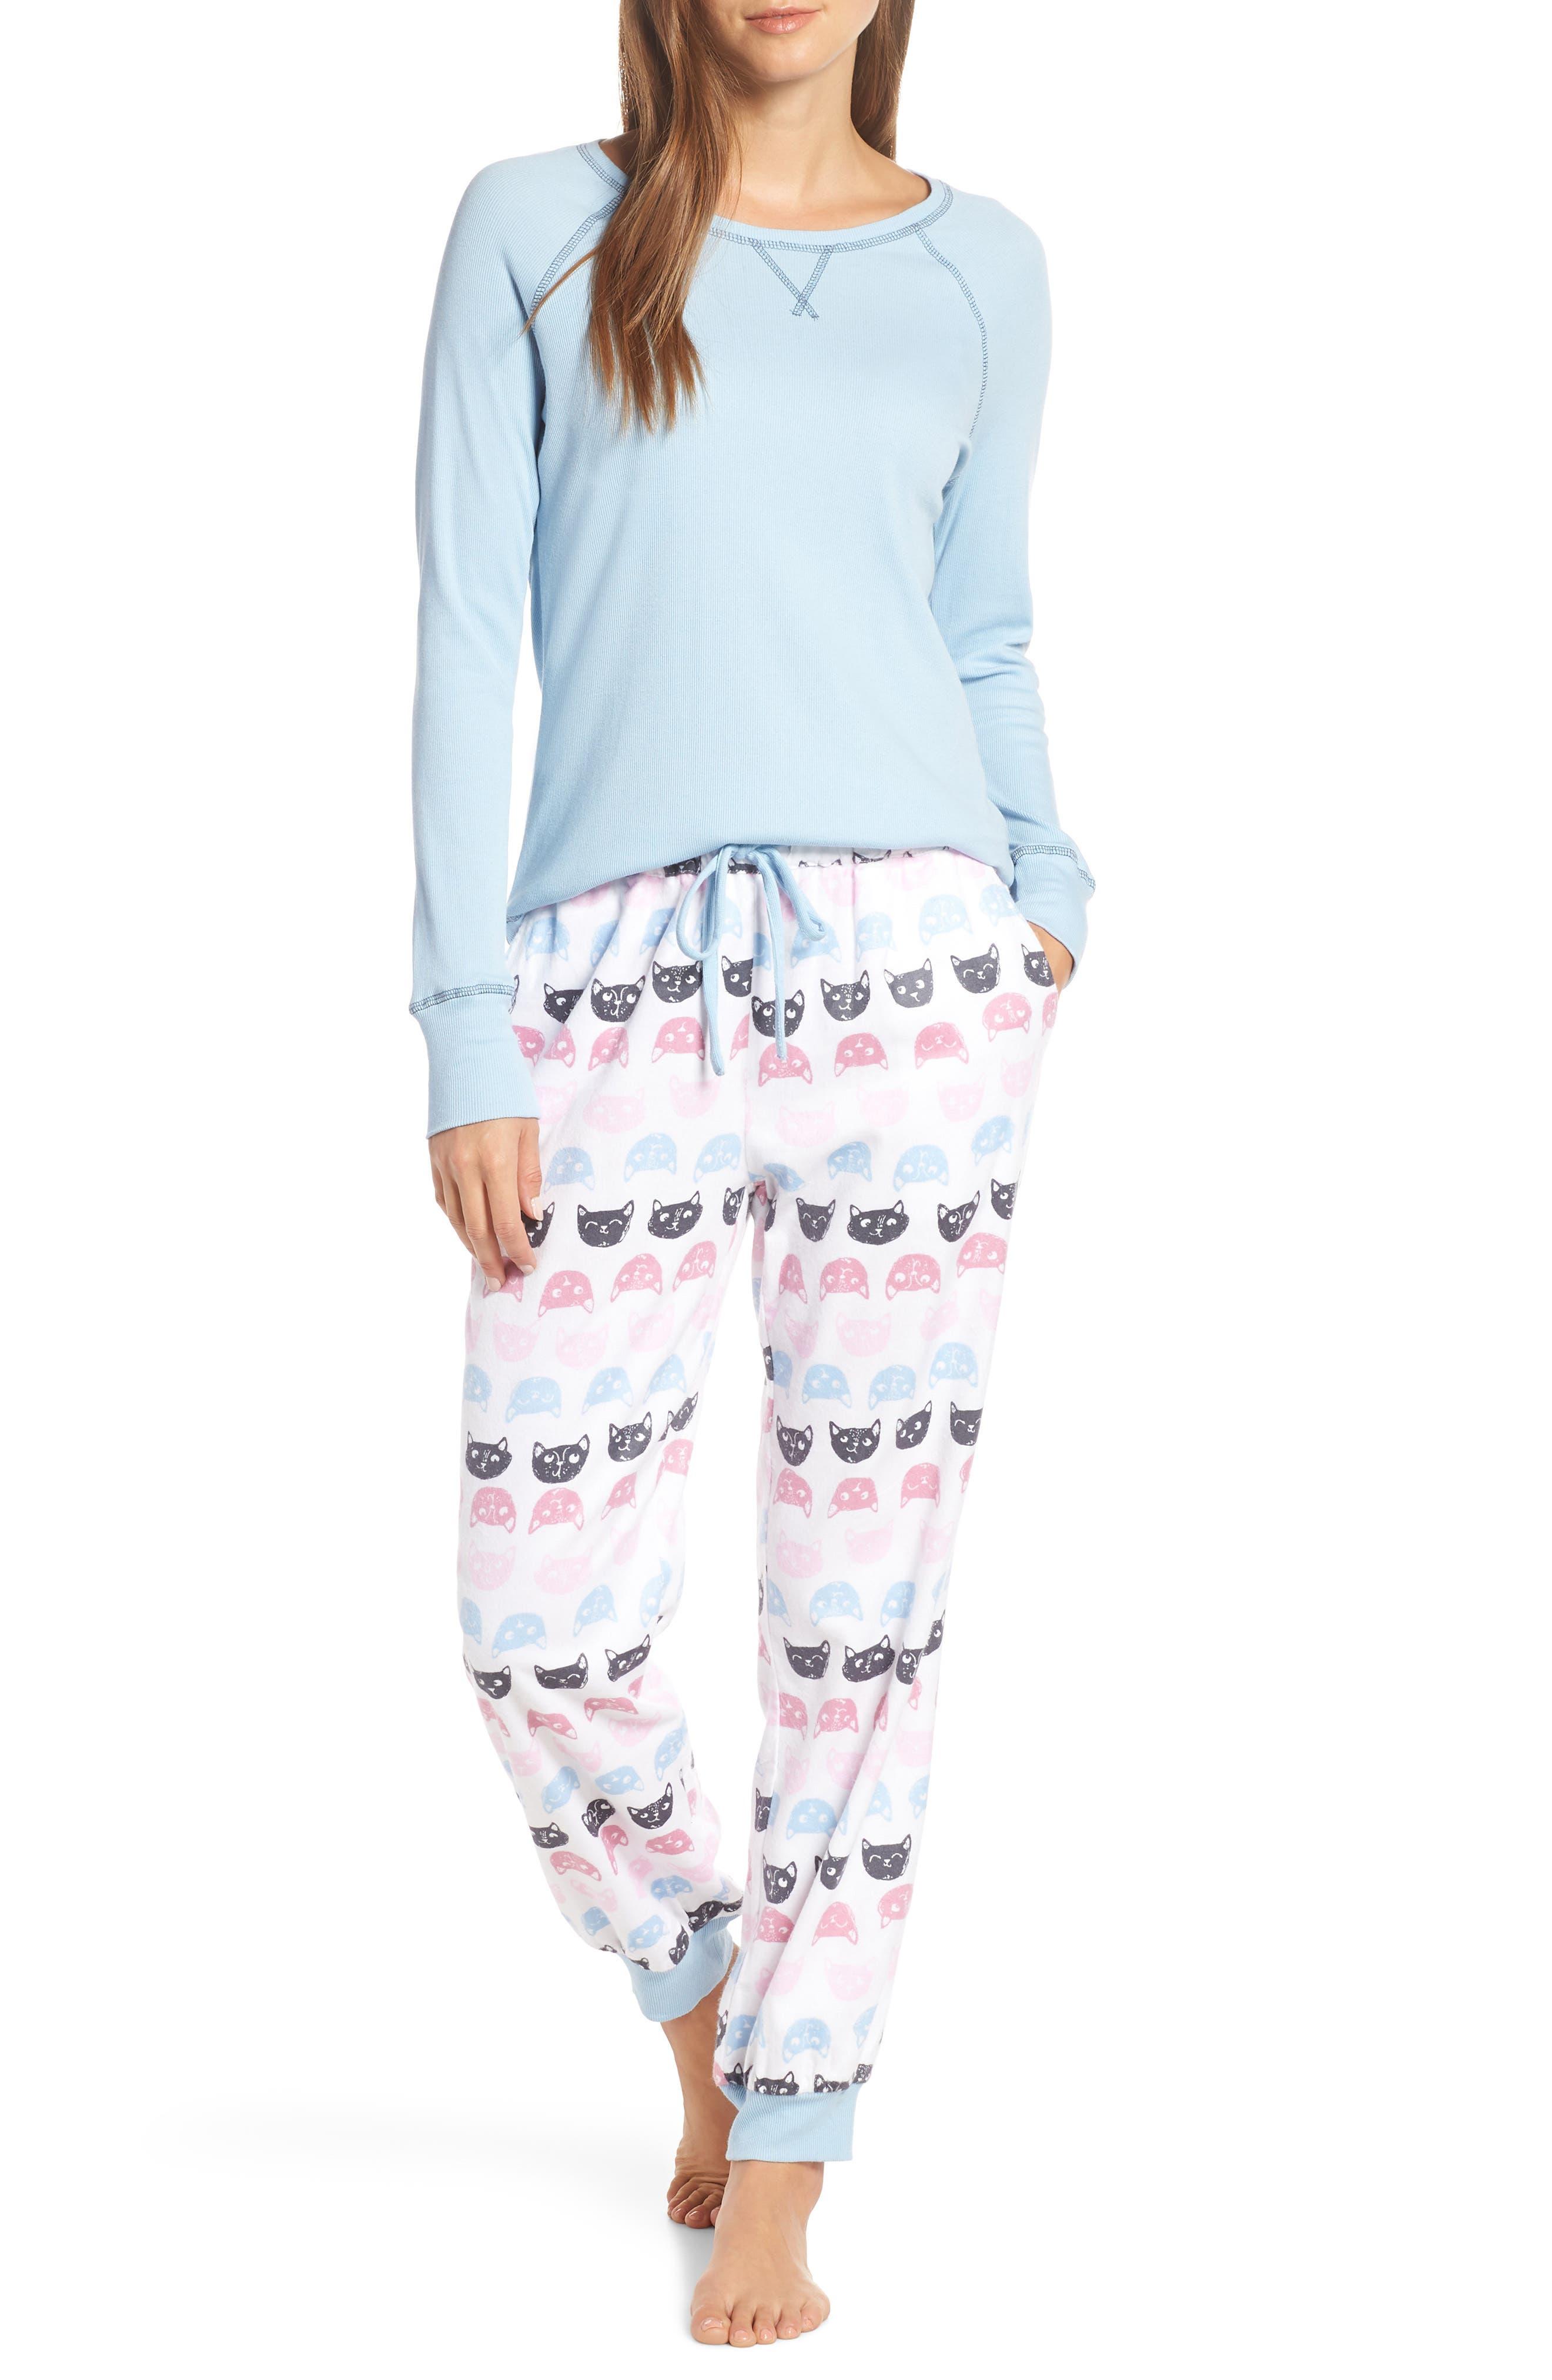 MUNKI MUNKI,                             Knit & Flannel Pajamas,                             Main thumbnail 1, color,                             WHITE CATS